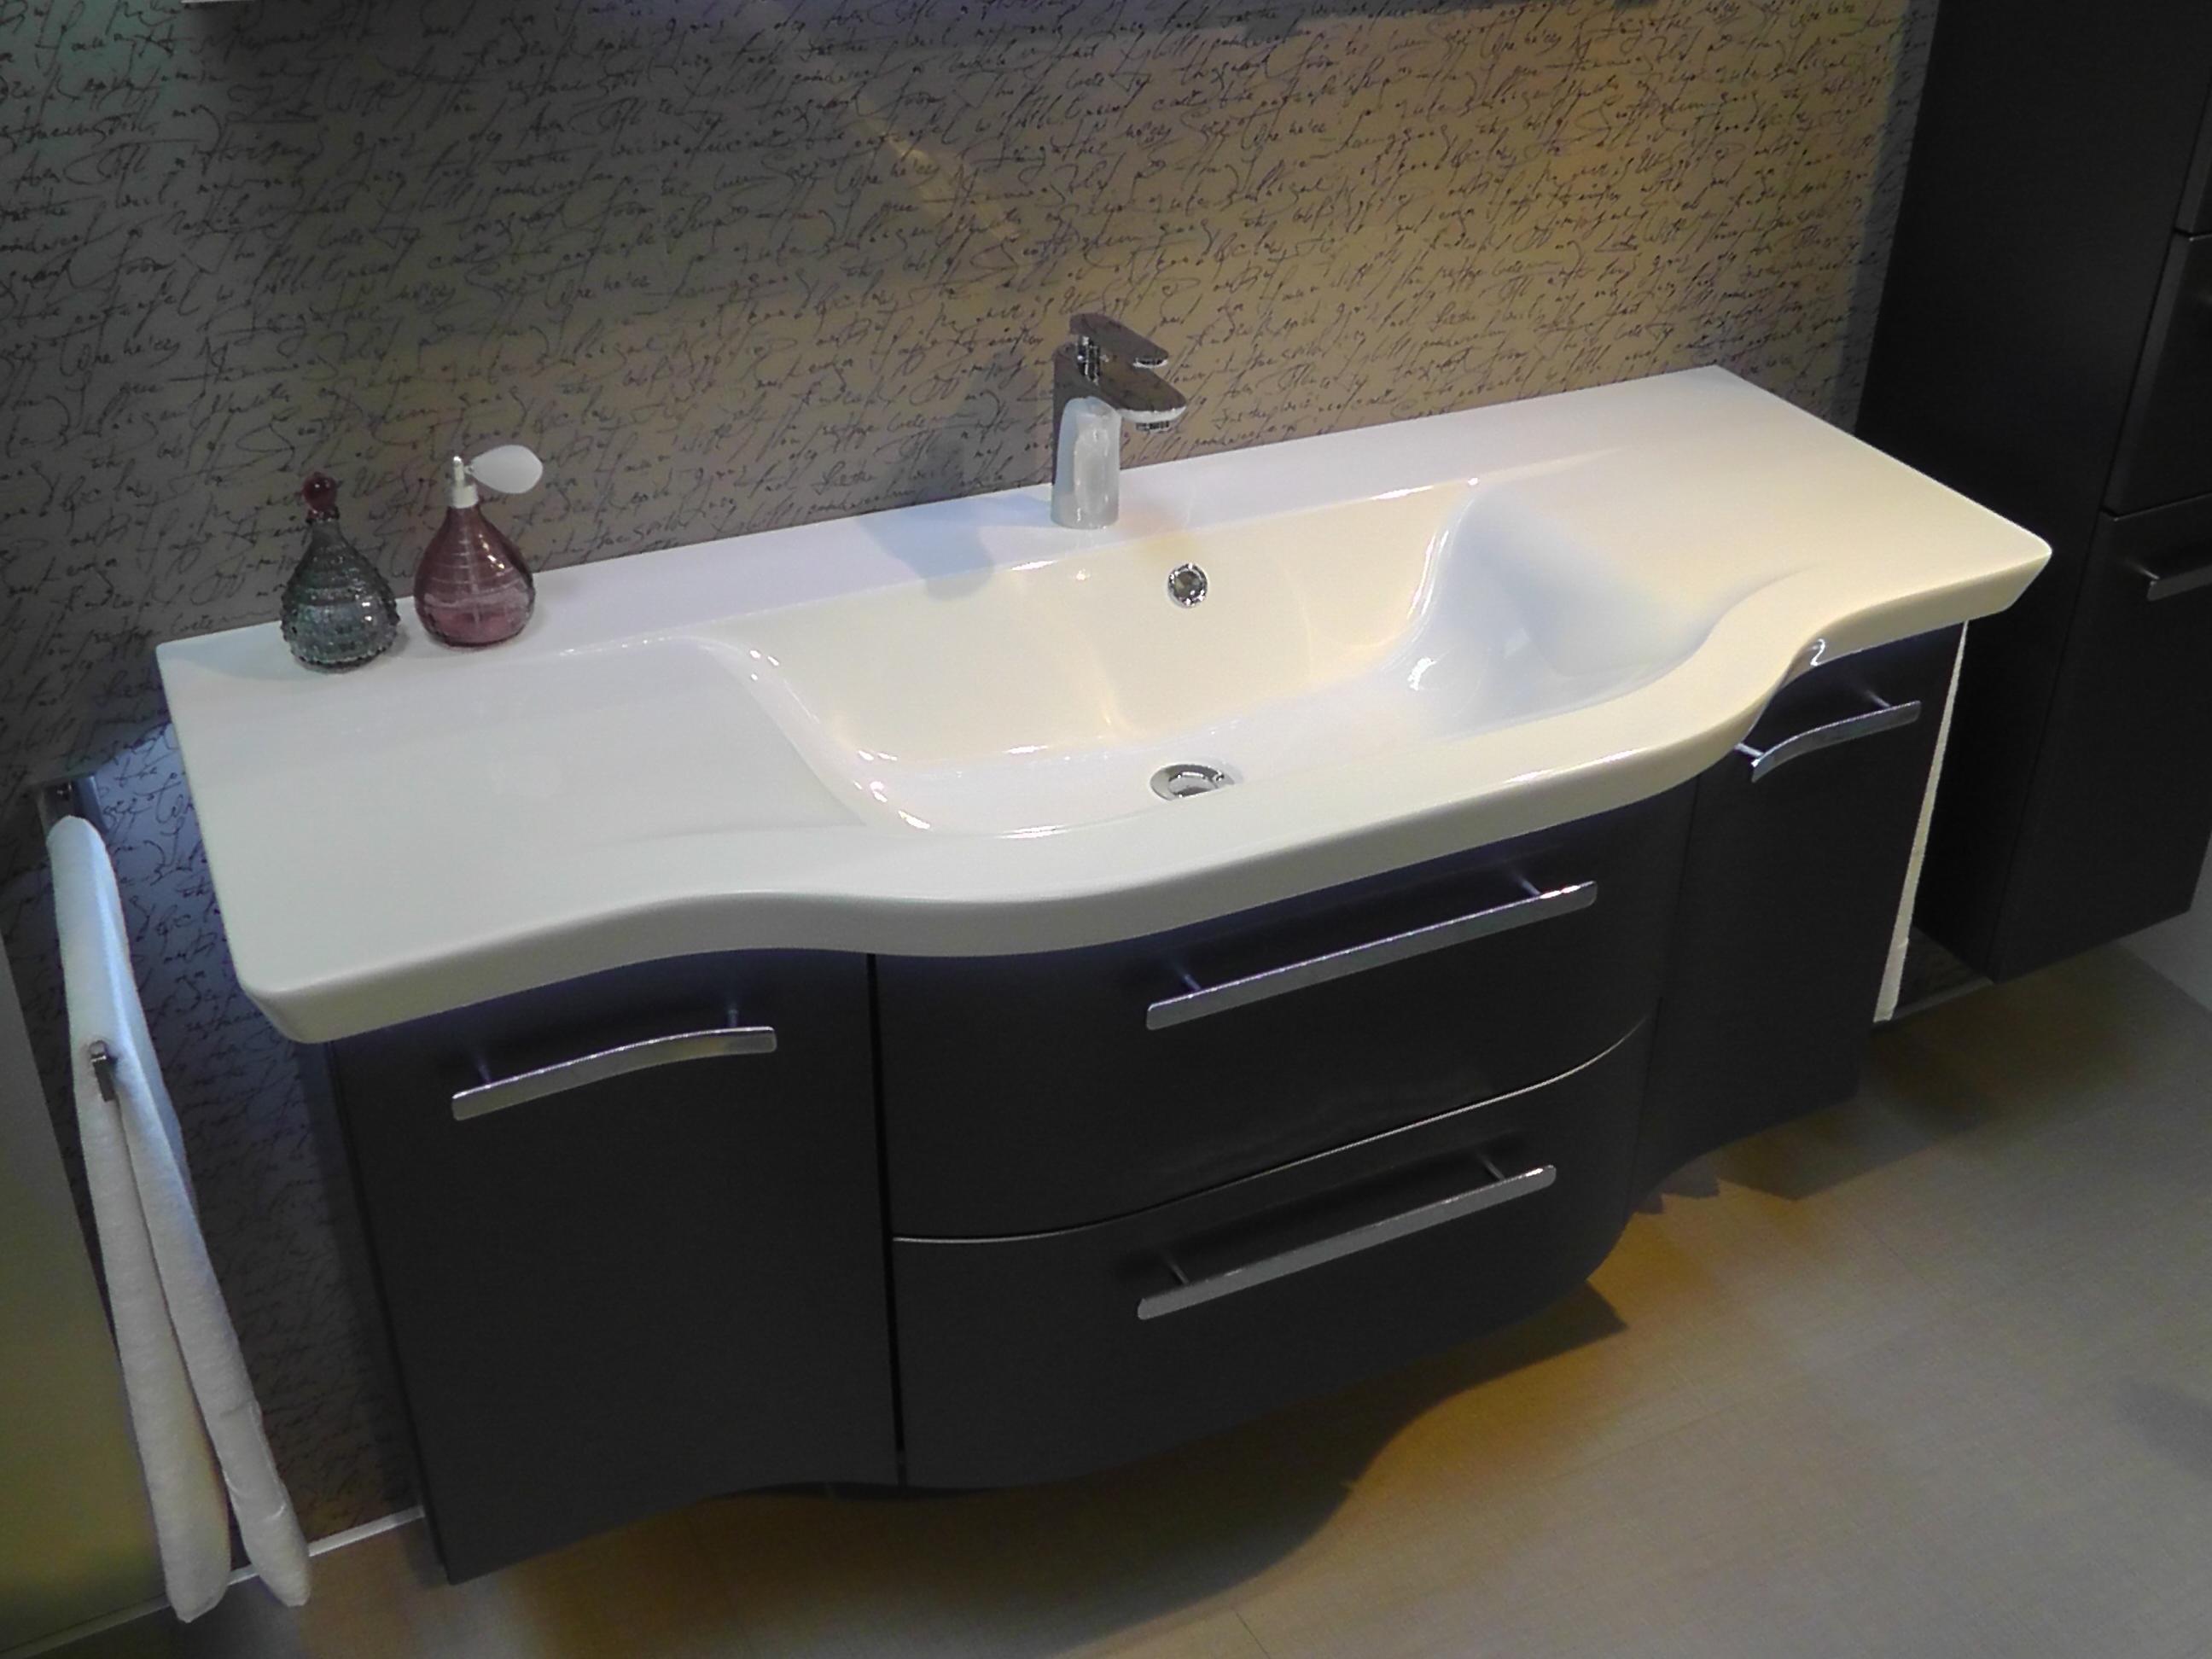 pelipal contea mineralgusswaschtisch 163 8 cm arcom center. Black Bedroom Furniture Sets. Home Design Ideas